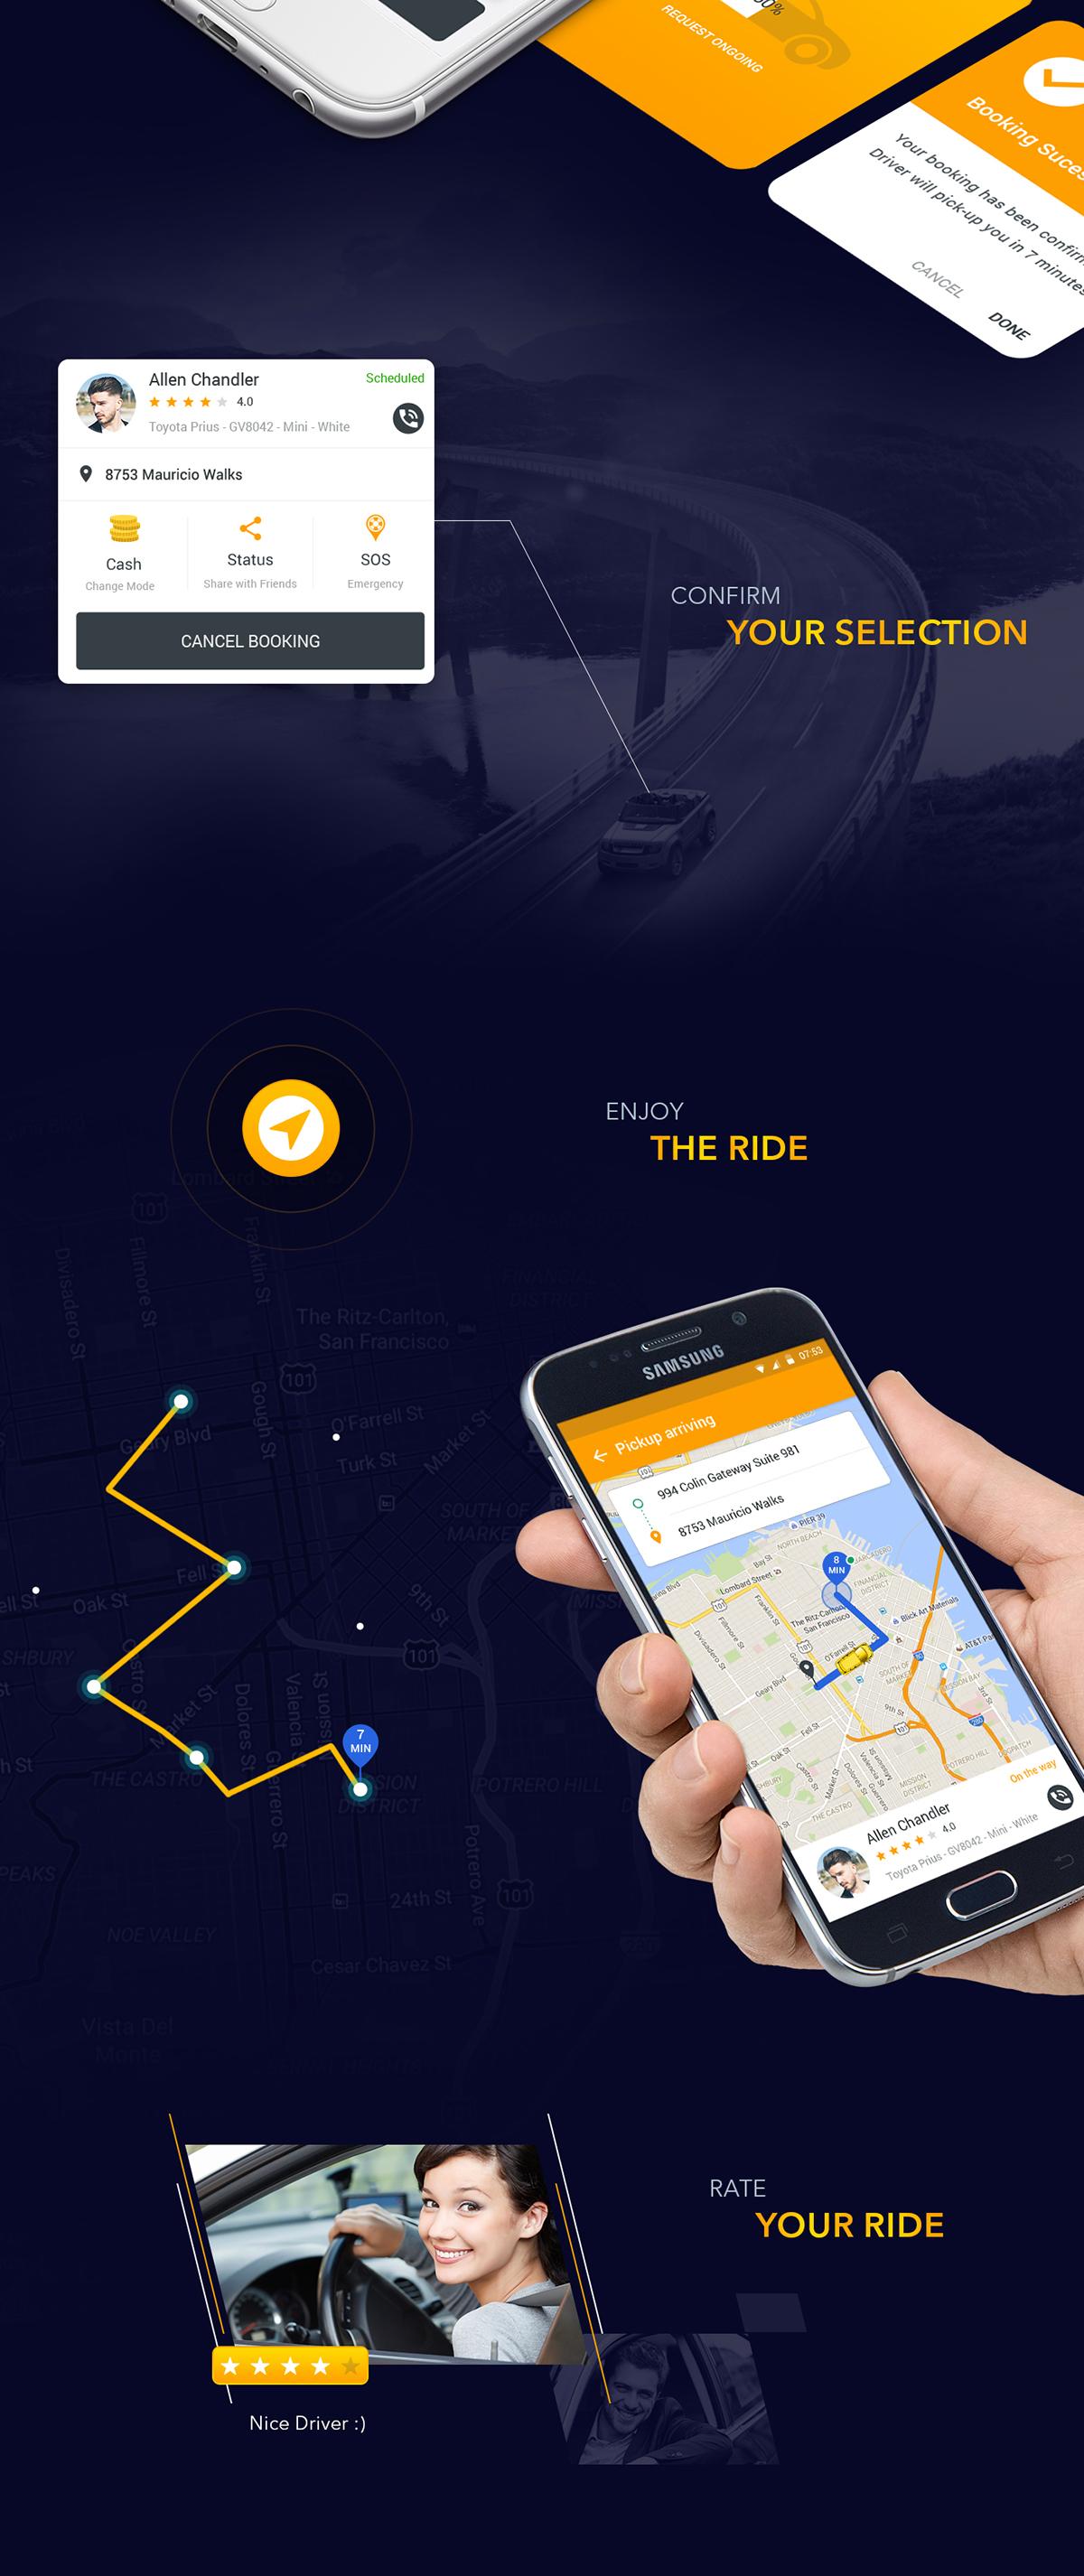 uber apps free download